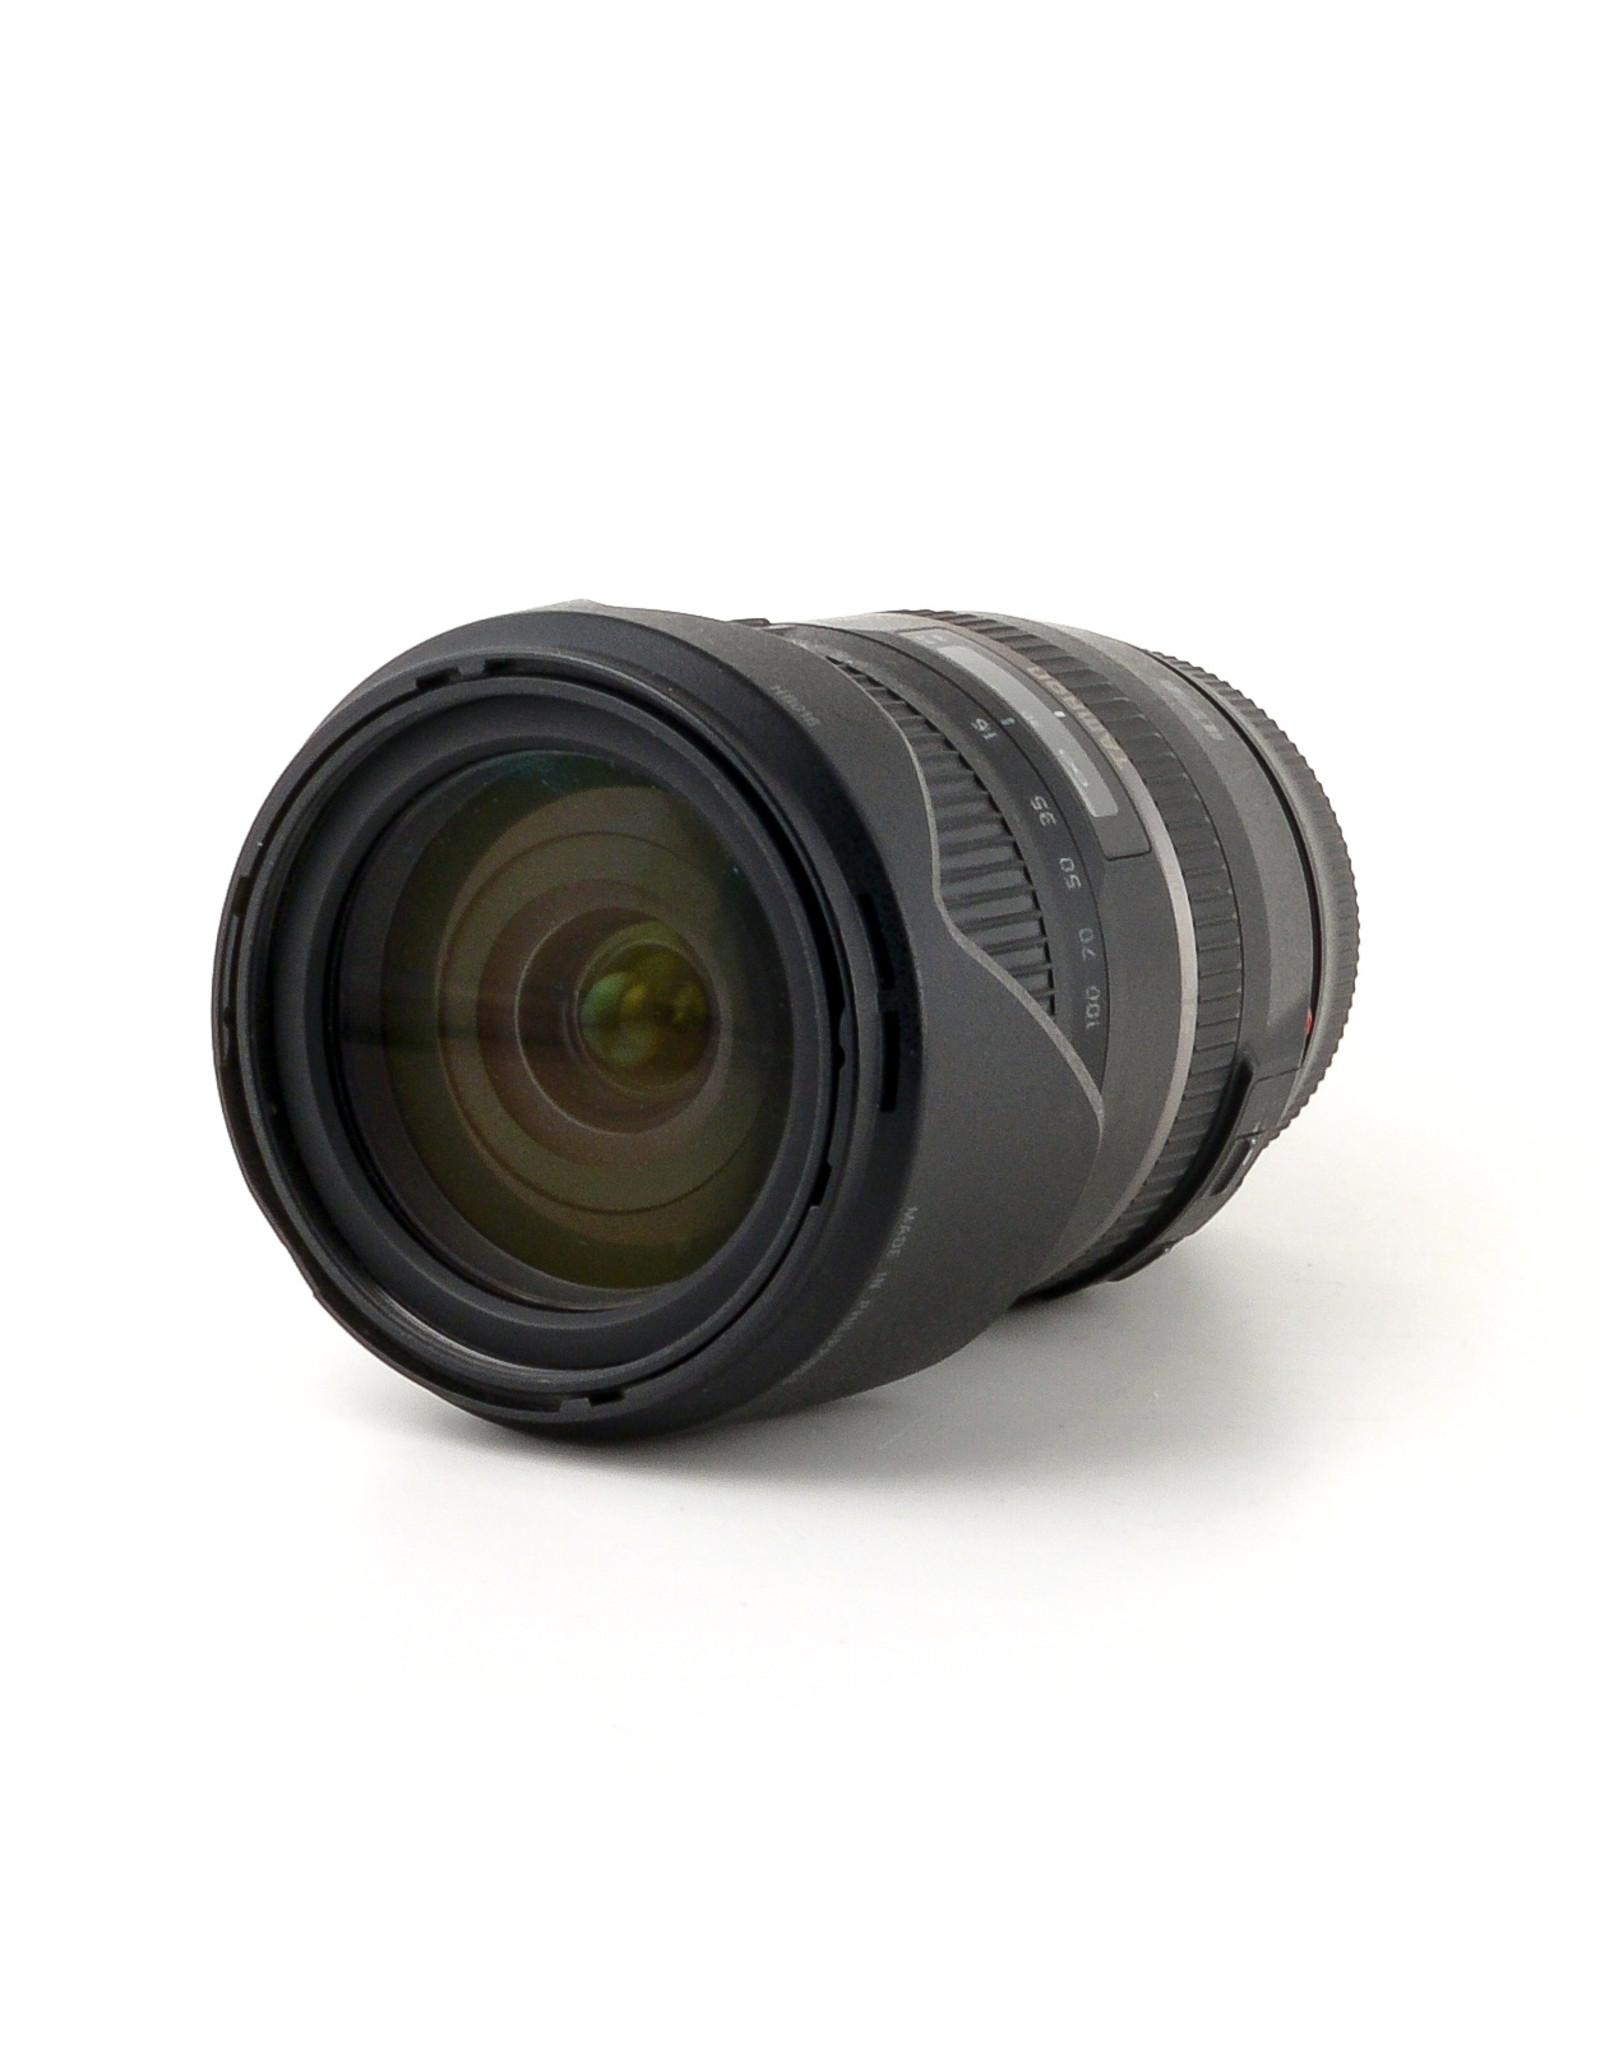 Tamron Occ Tamron für Canon EF-S 16-300 / 3.5-6.3 VC (Canon)